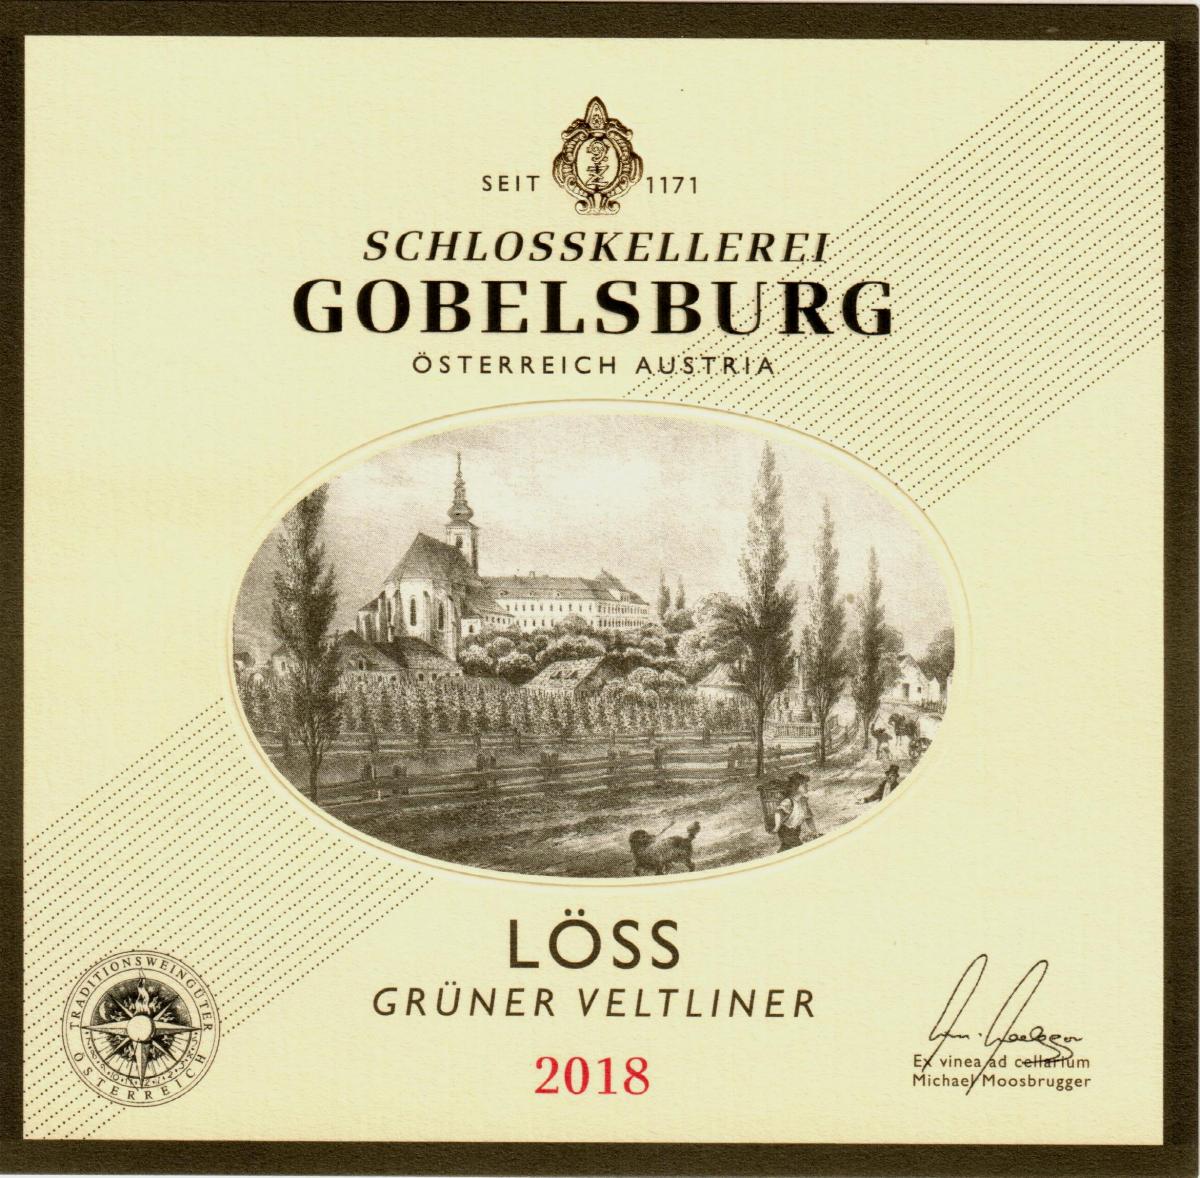 Label Schlosskellerei Gobelsburg